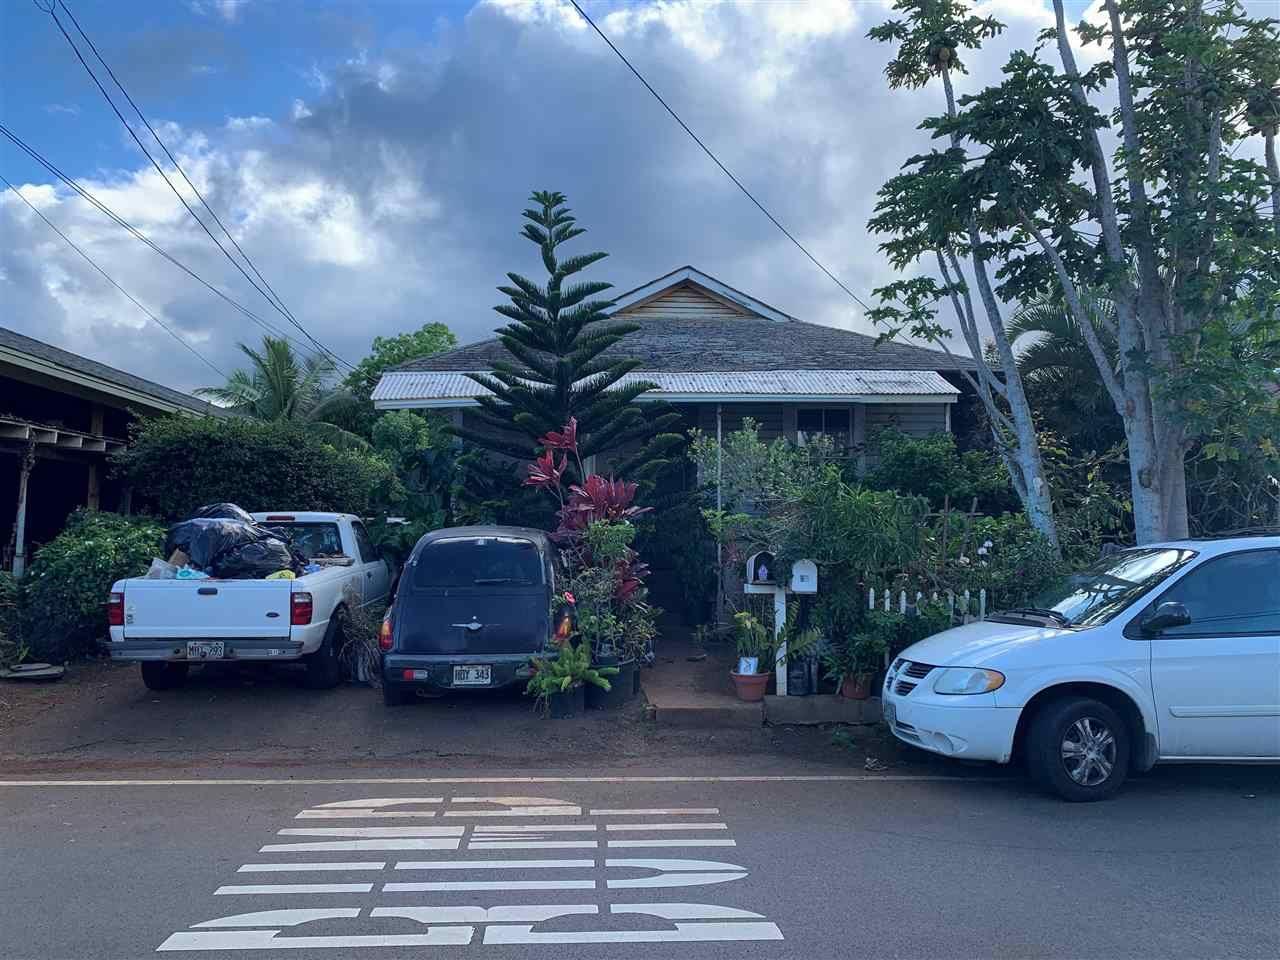 Photo of 95 Mission St, Wailuku, HI 96793-1833 (MLS # 391131)